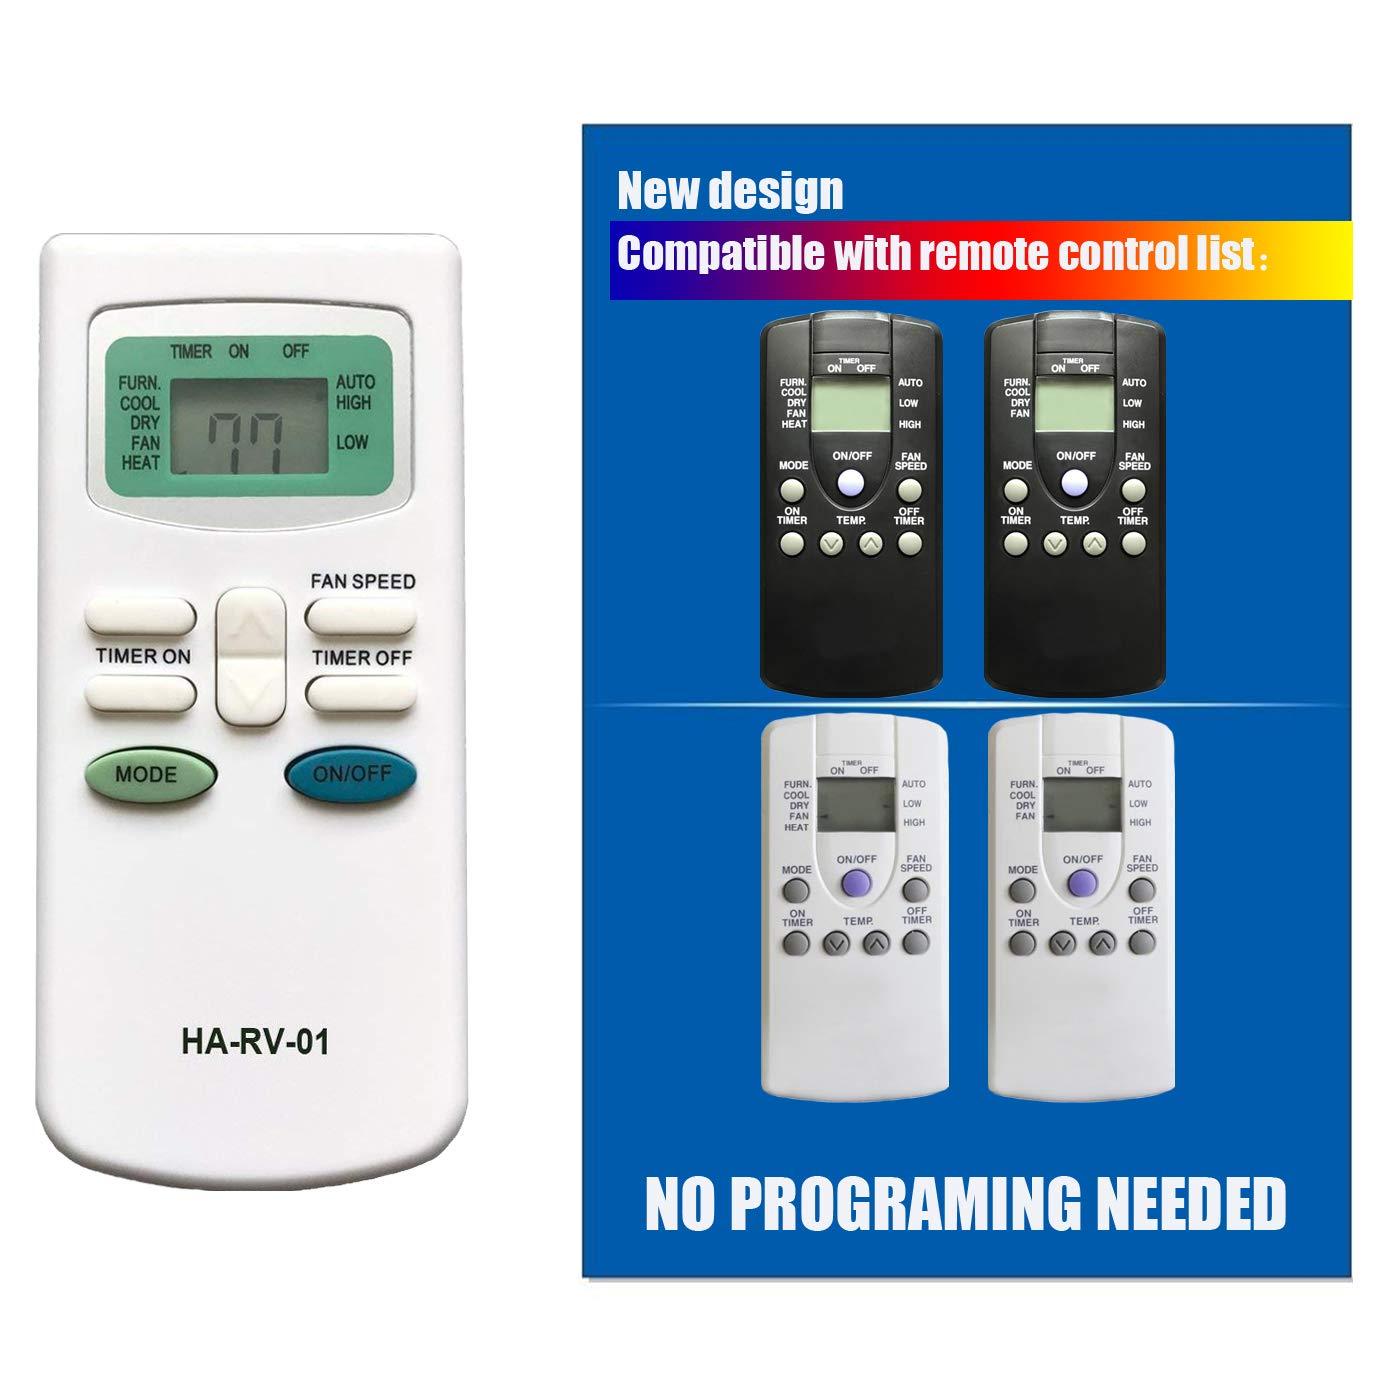 Replacement for Carrier Air V Airv Rv Air Conditioners Remote Control for 12-50095-00 12-50074-00 12-50152-00 68RV11302A 68RV14102A 68RV14103A 68RV14112A 68RV15102A 68RV15103A 68RV0010AA 68RV0010BA by Generic